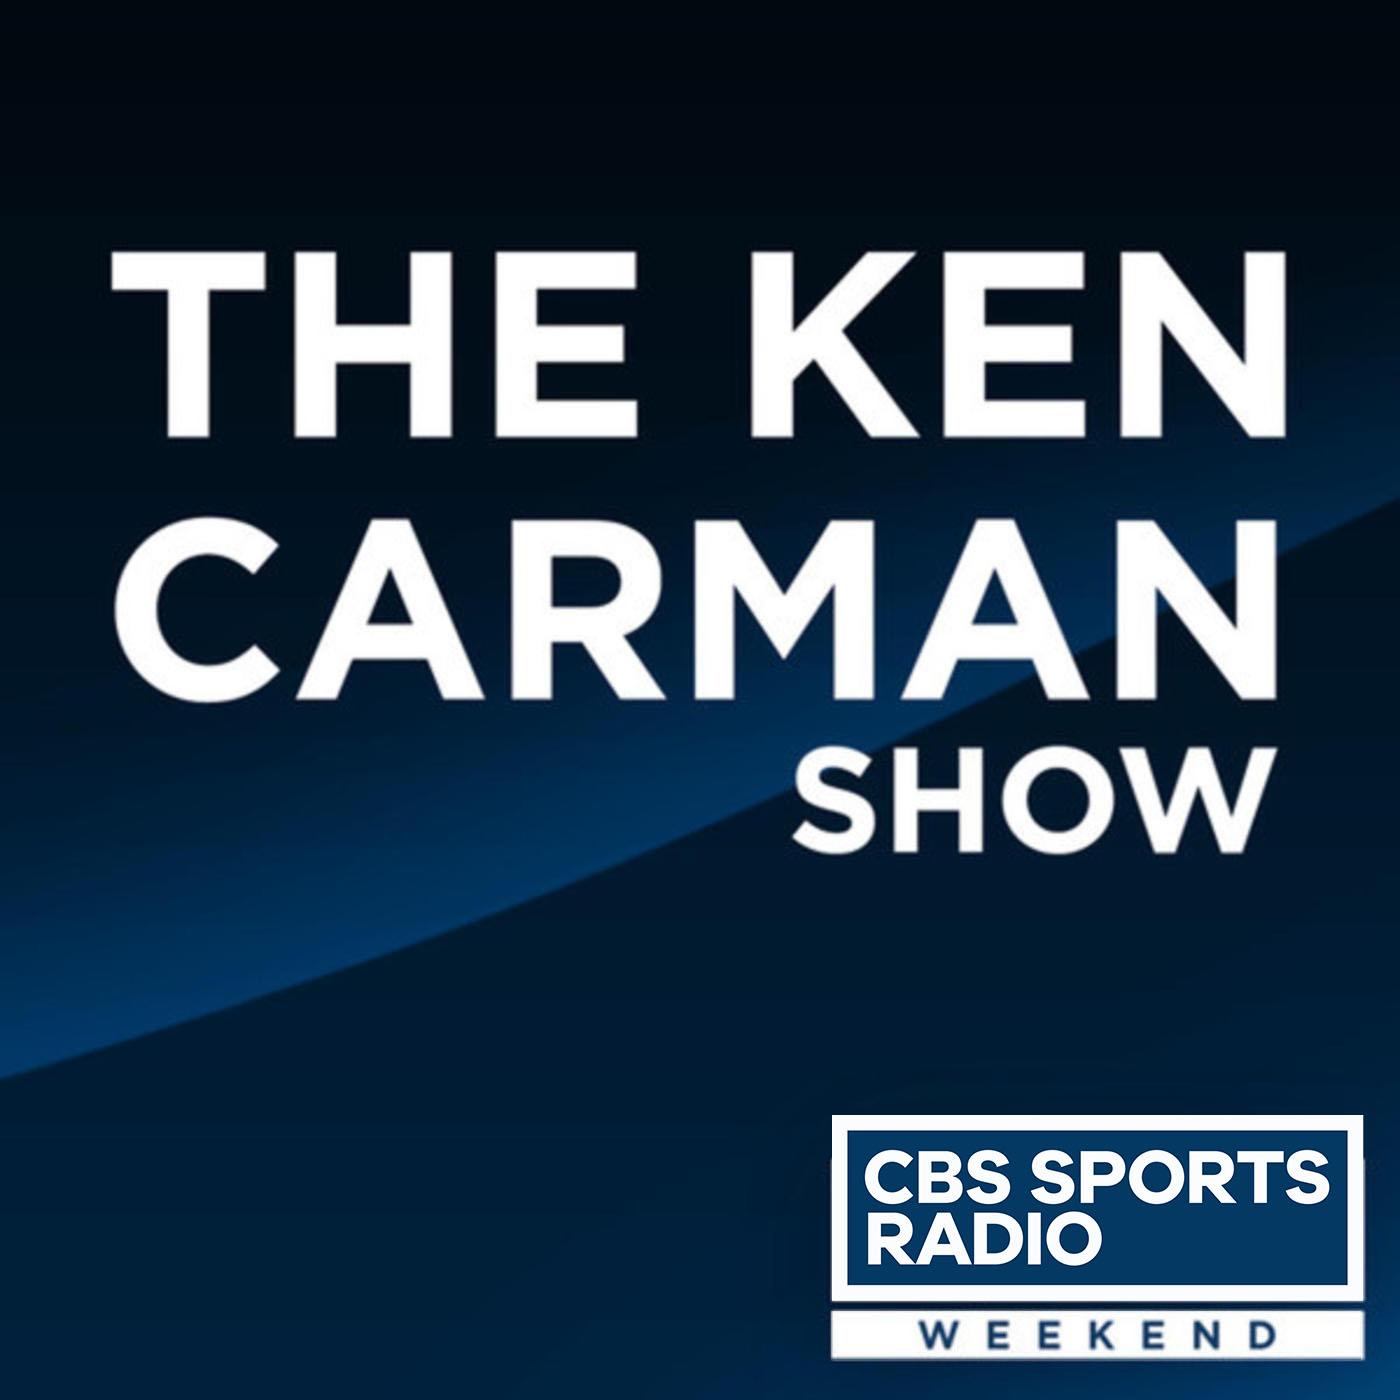 The Ken Carman Show